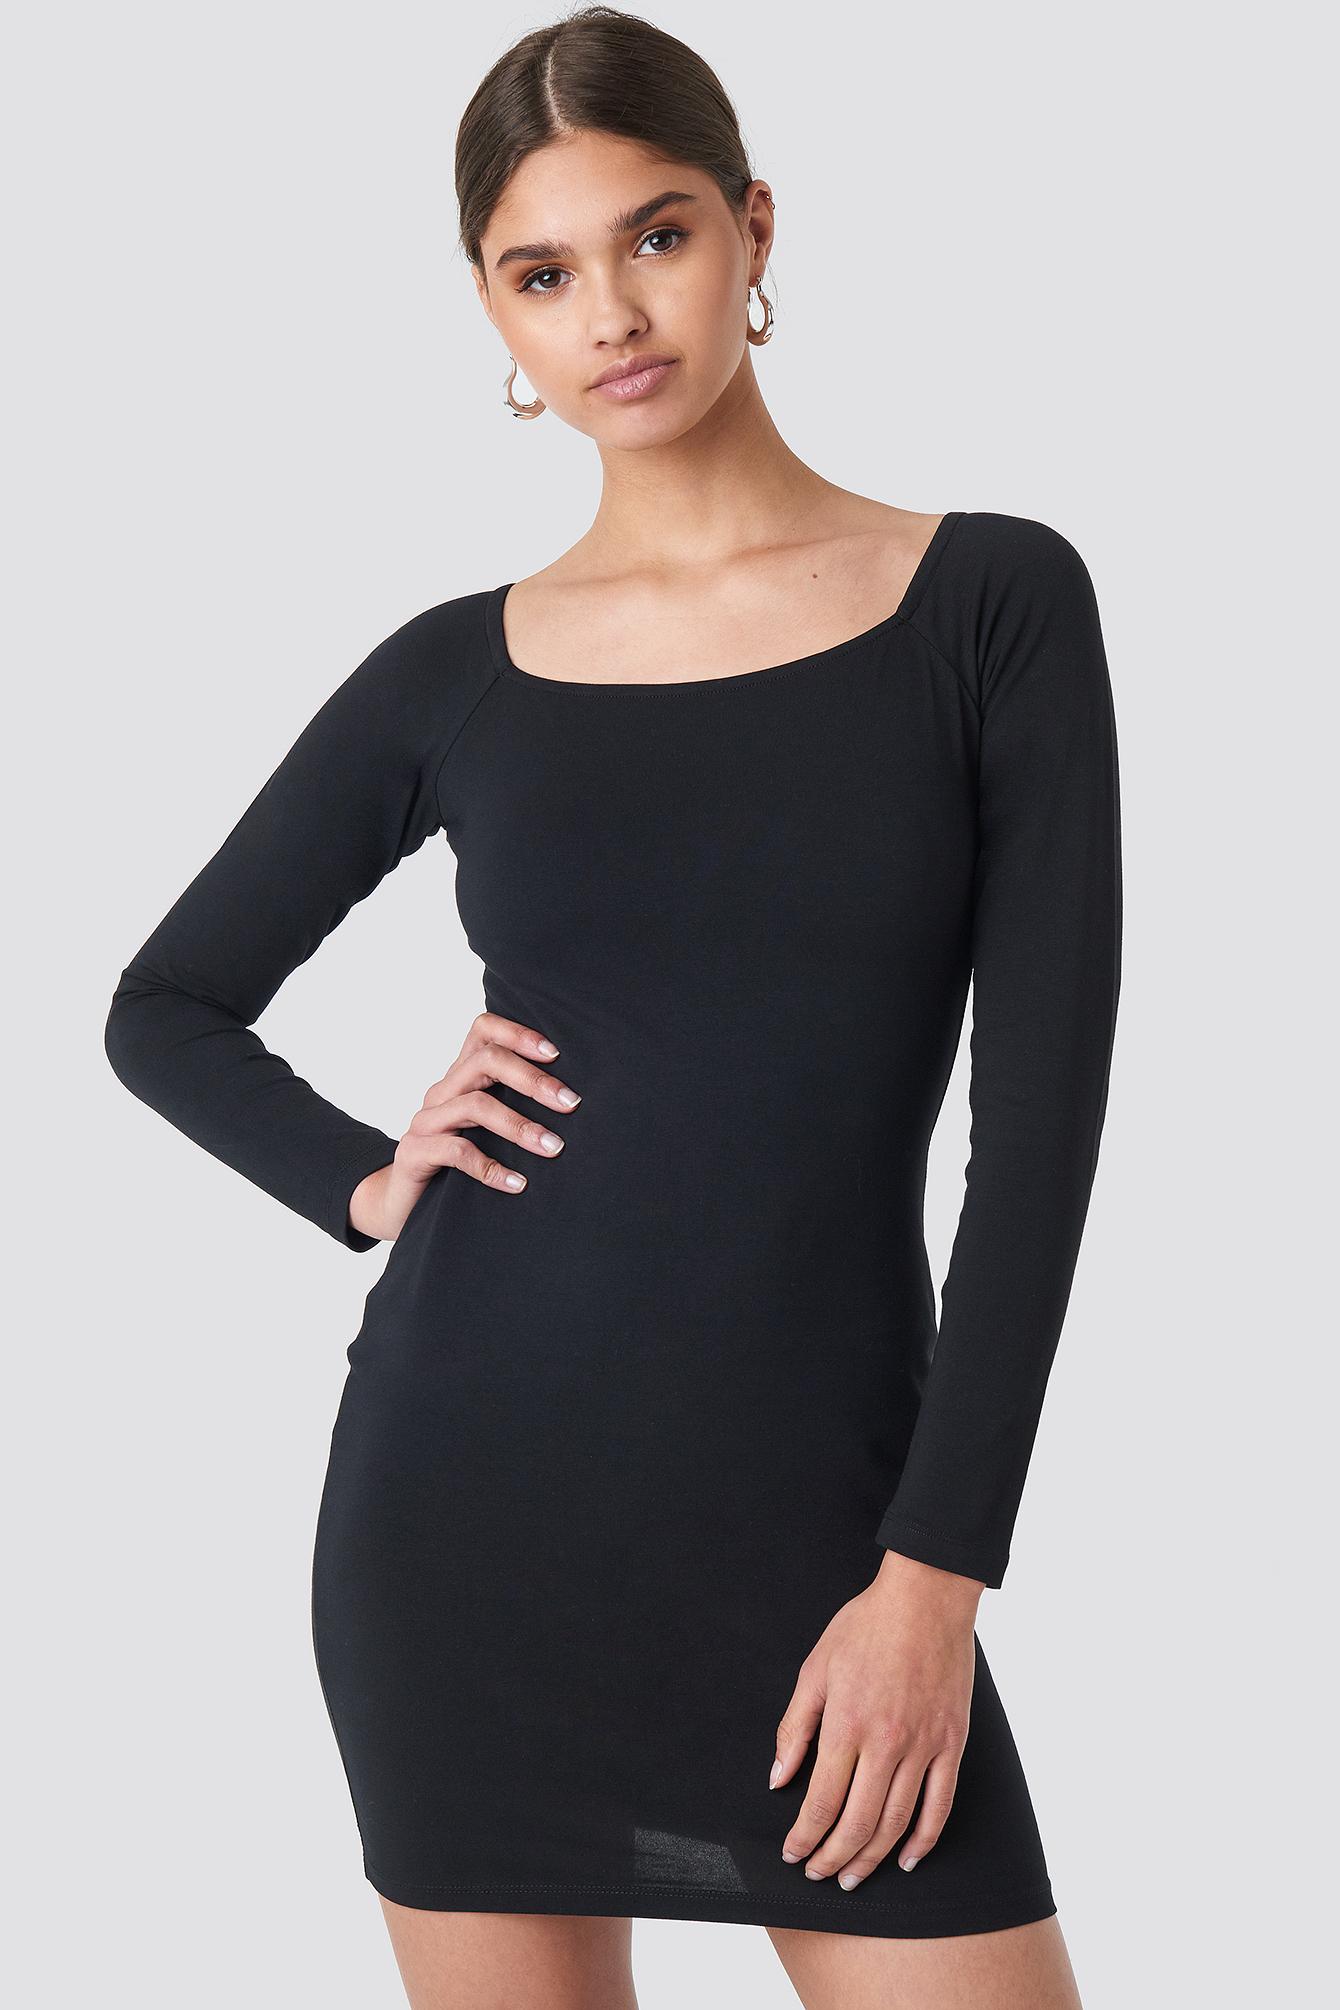 Square Neckline Fitted Dress NA-KD.COM